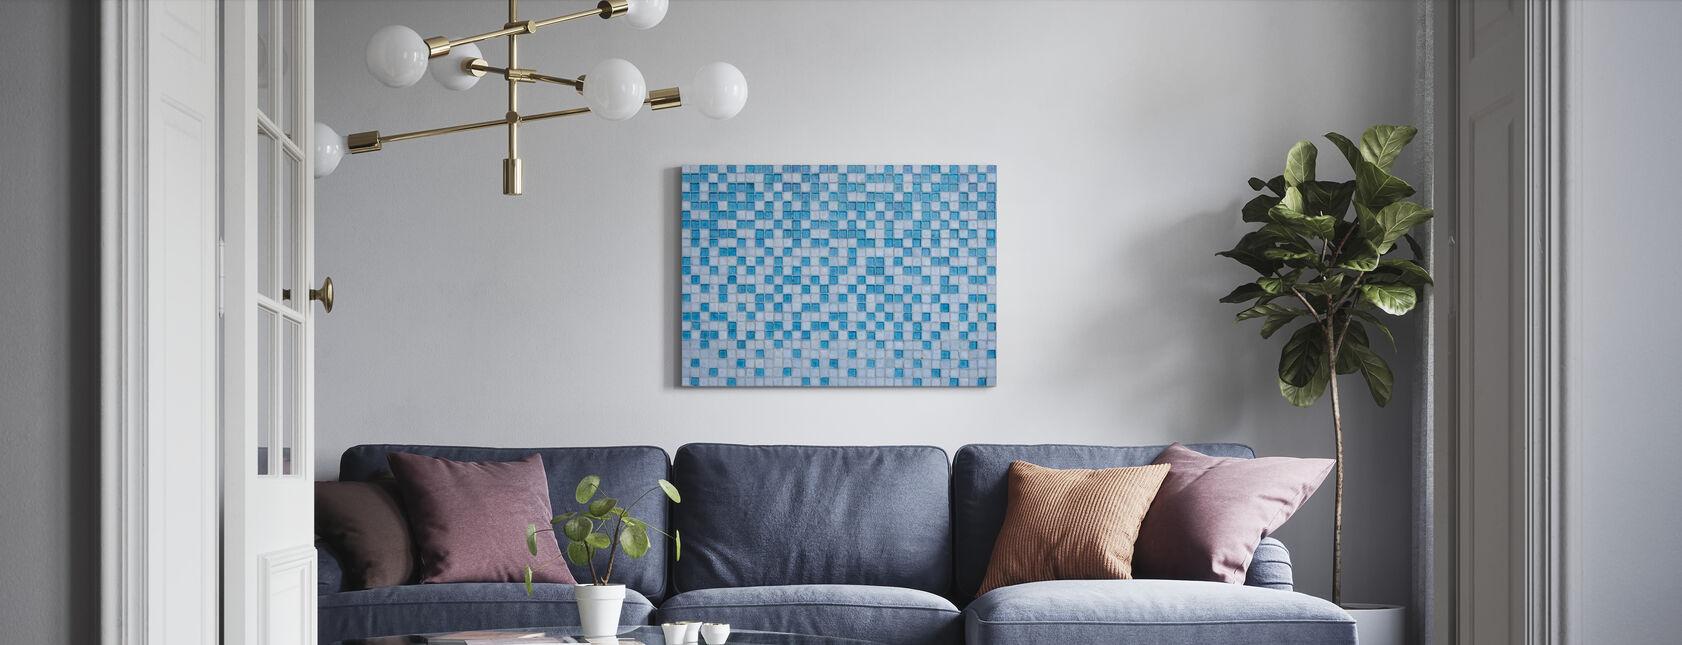 Miami Mosaik - Canvastavla - Vardagsrum